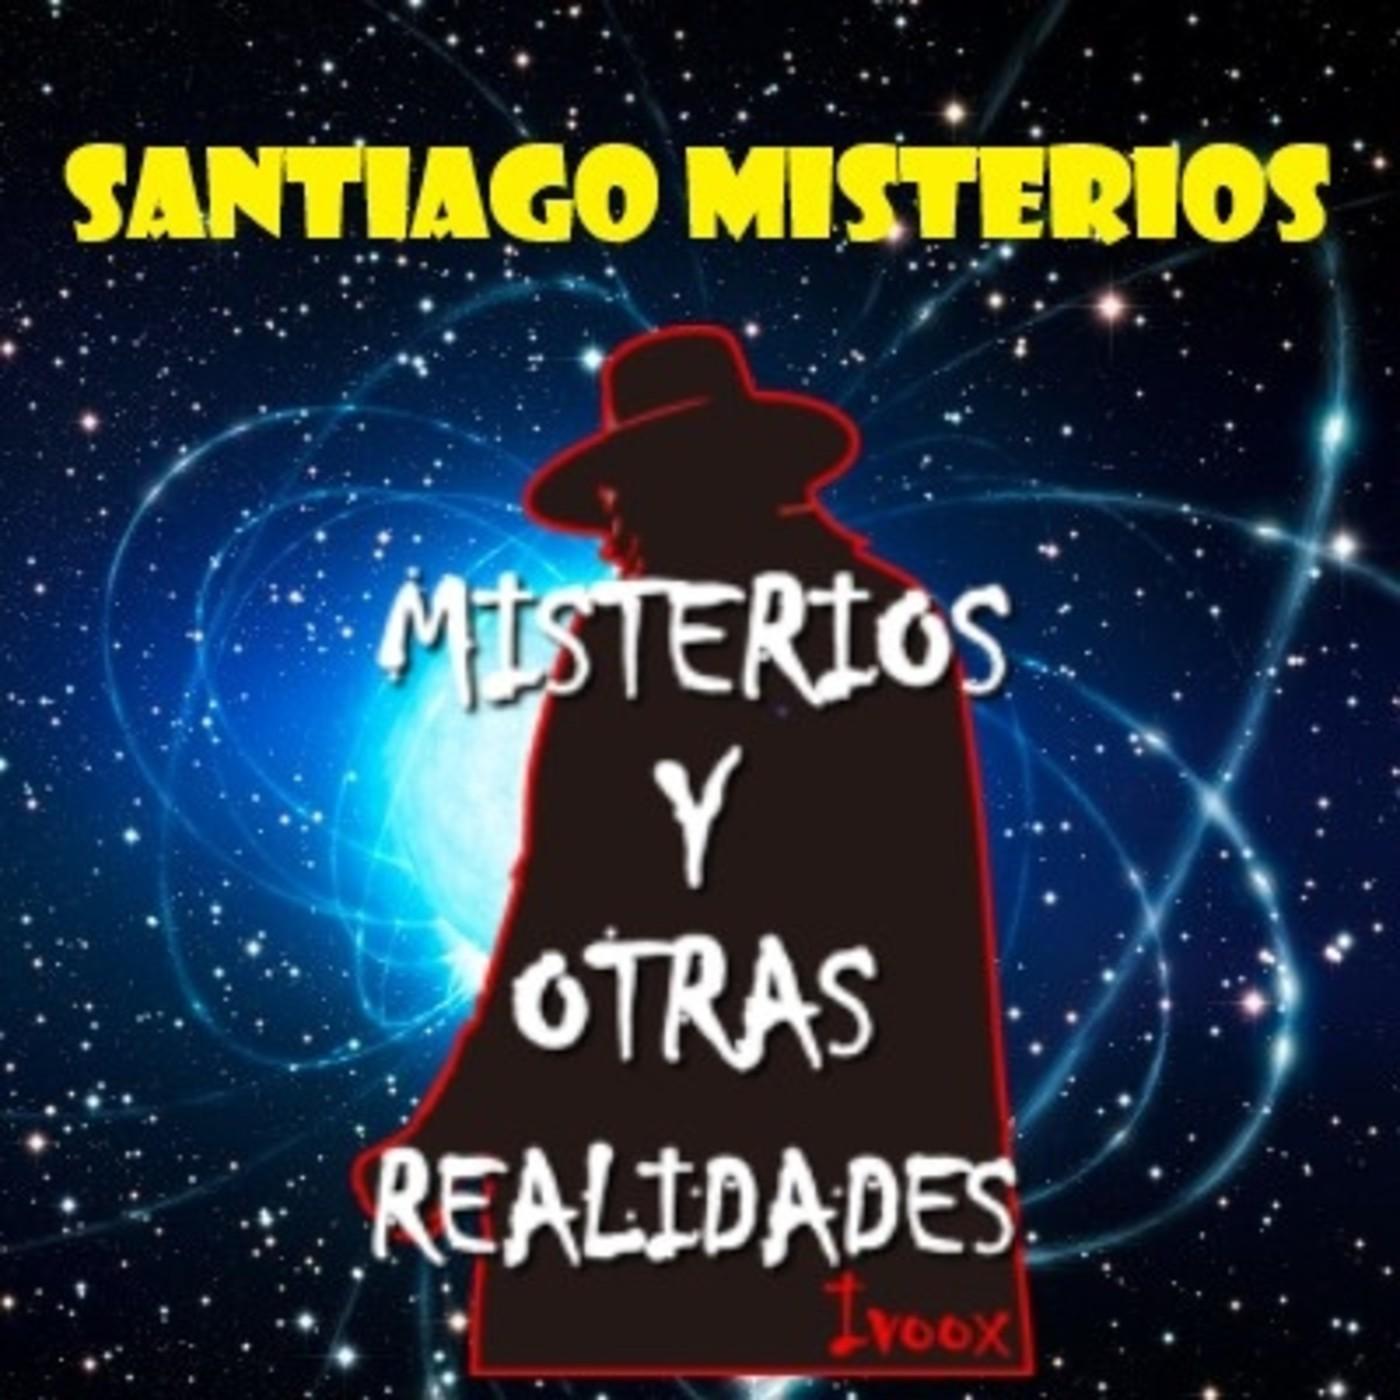 1. Misterio Estelar: Gorila Cosmico, Chemtrails, Jack el Destripador ...